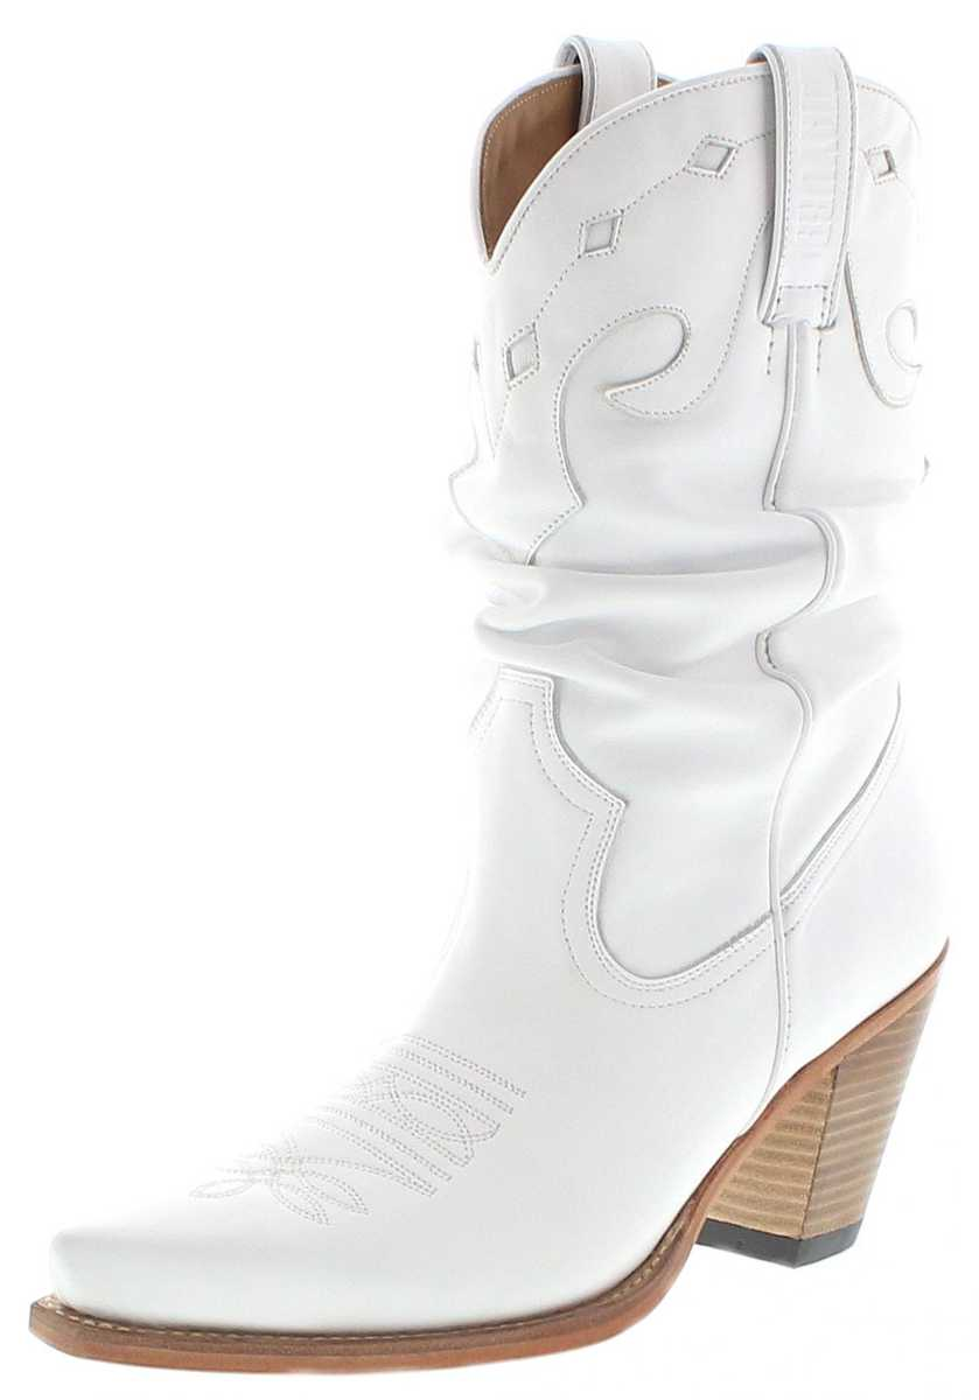 Mayura Boots 1952-X-B Blanco Ladies Western Boots - white